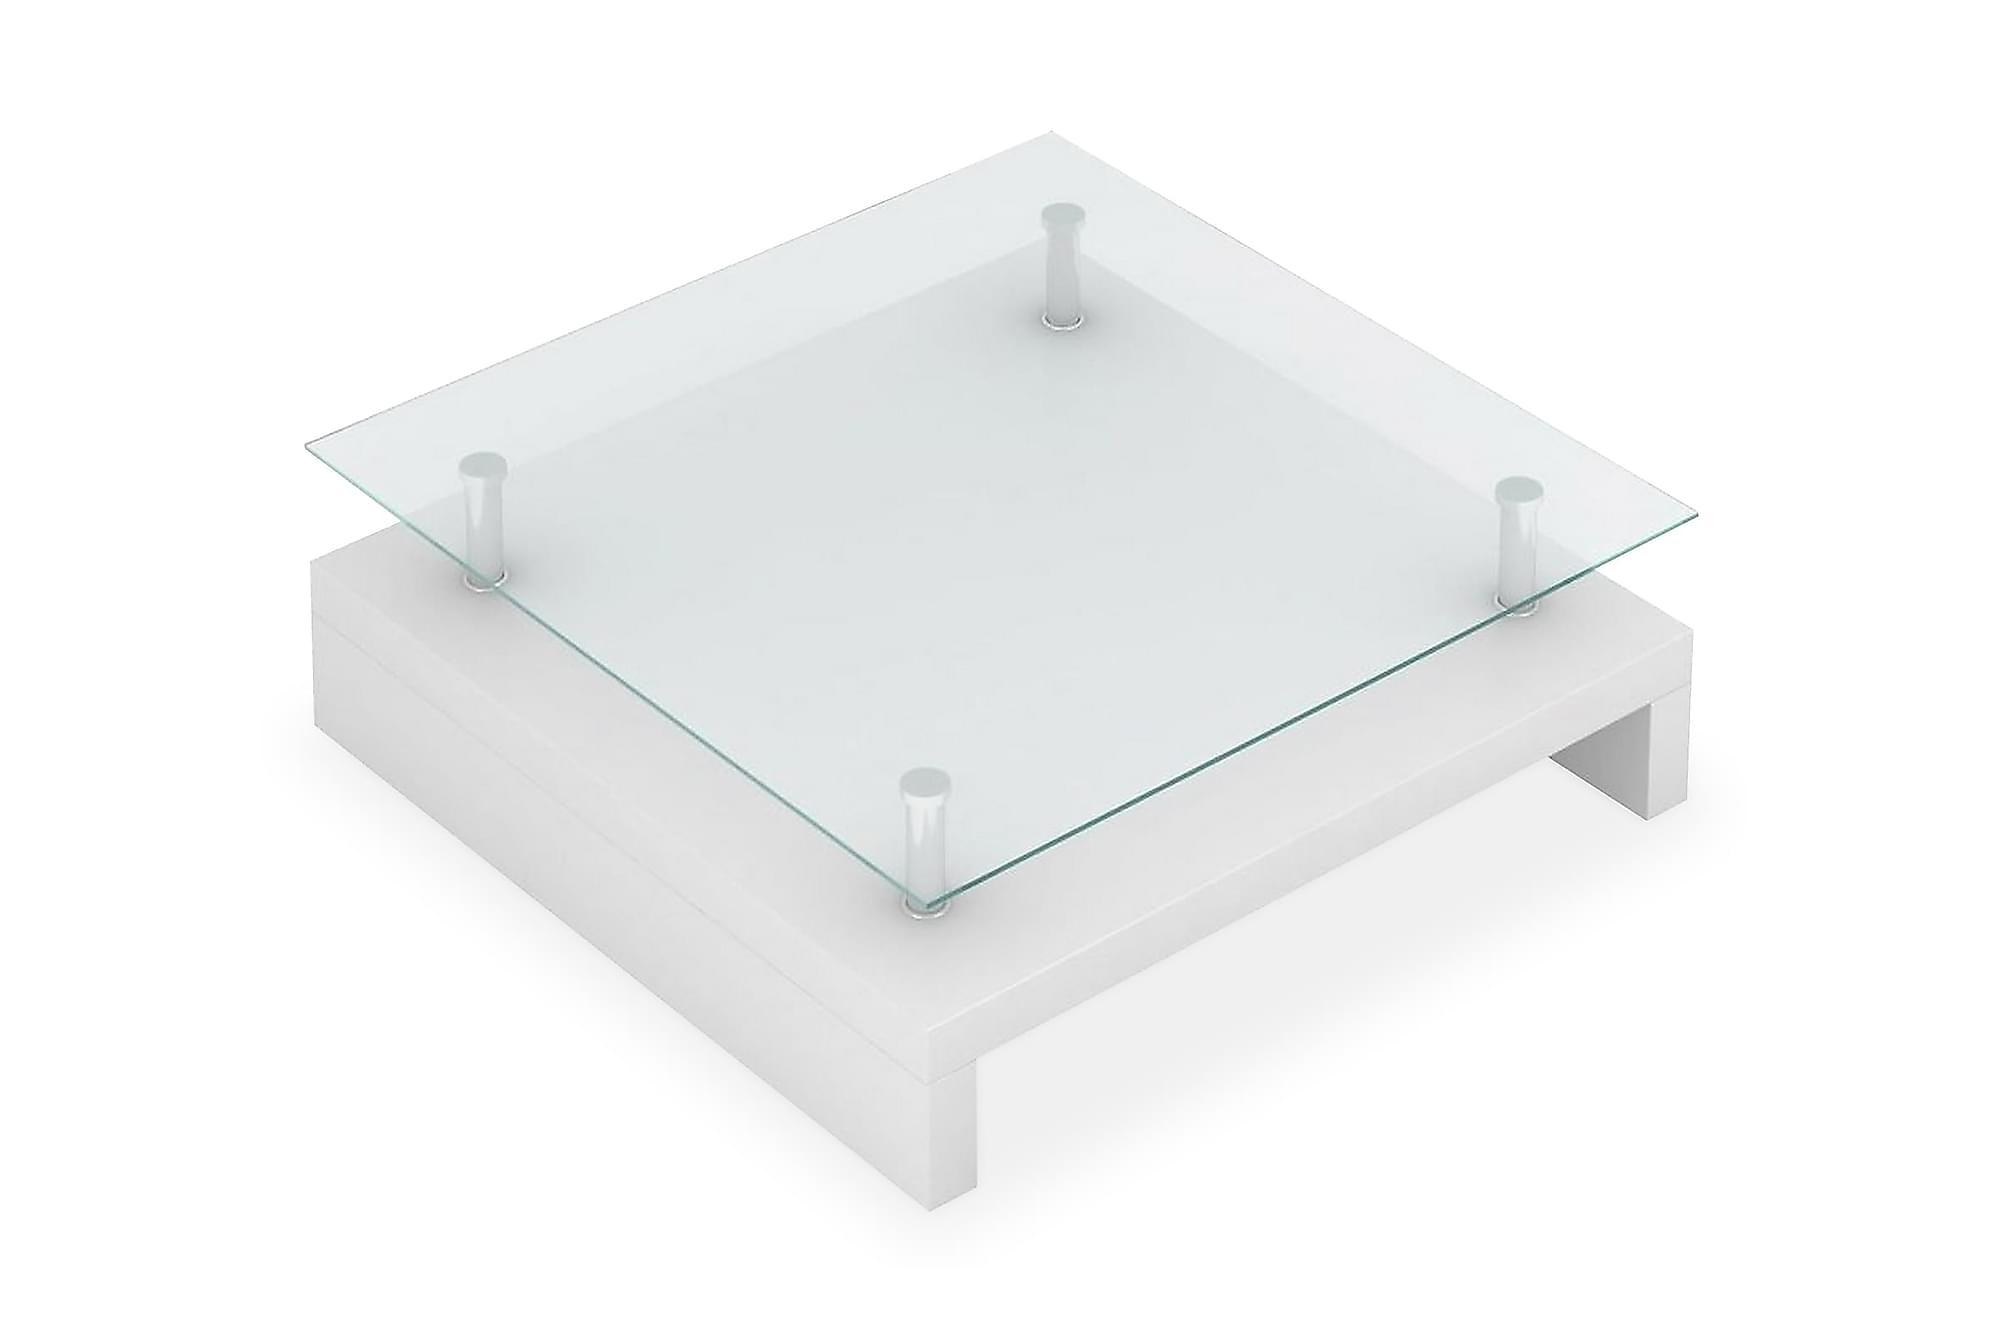 Soffbord med bordsskiva i glas vit